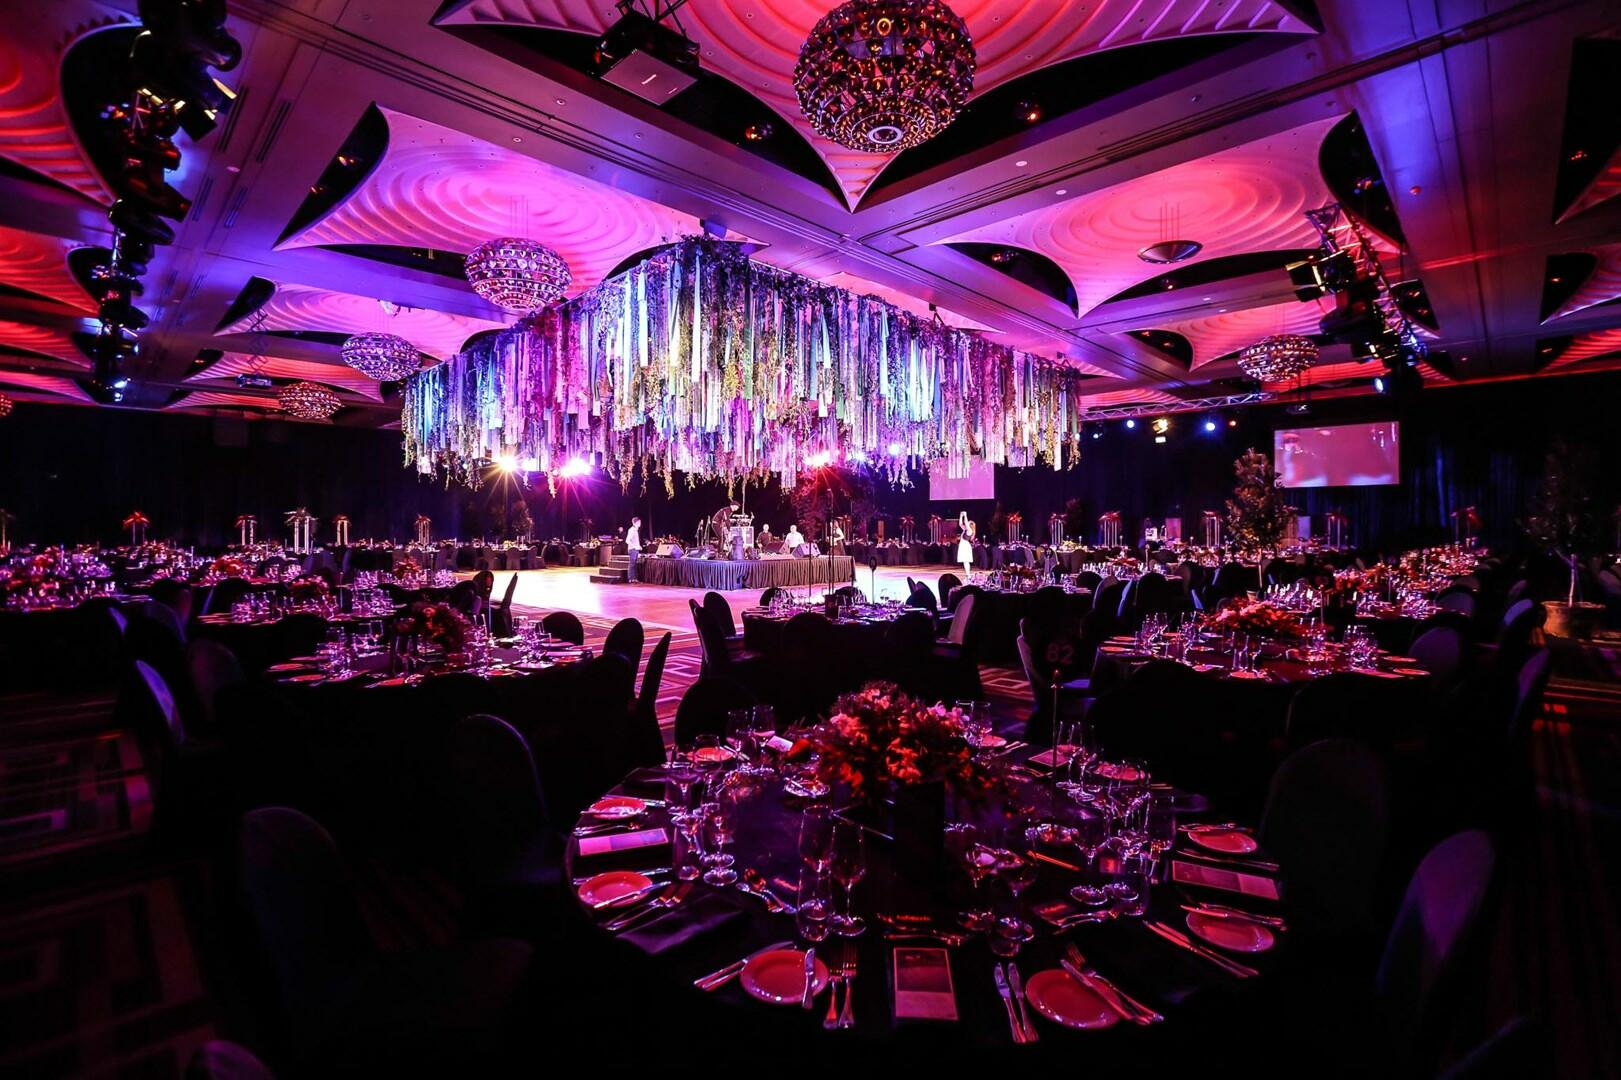 Events & conferences at Melbourne hotel